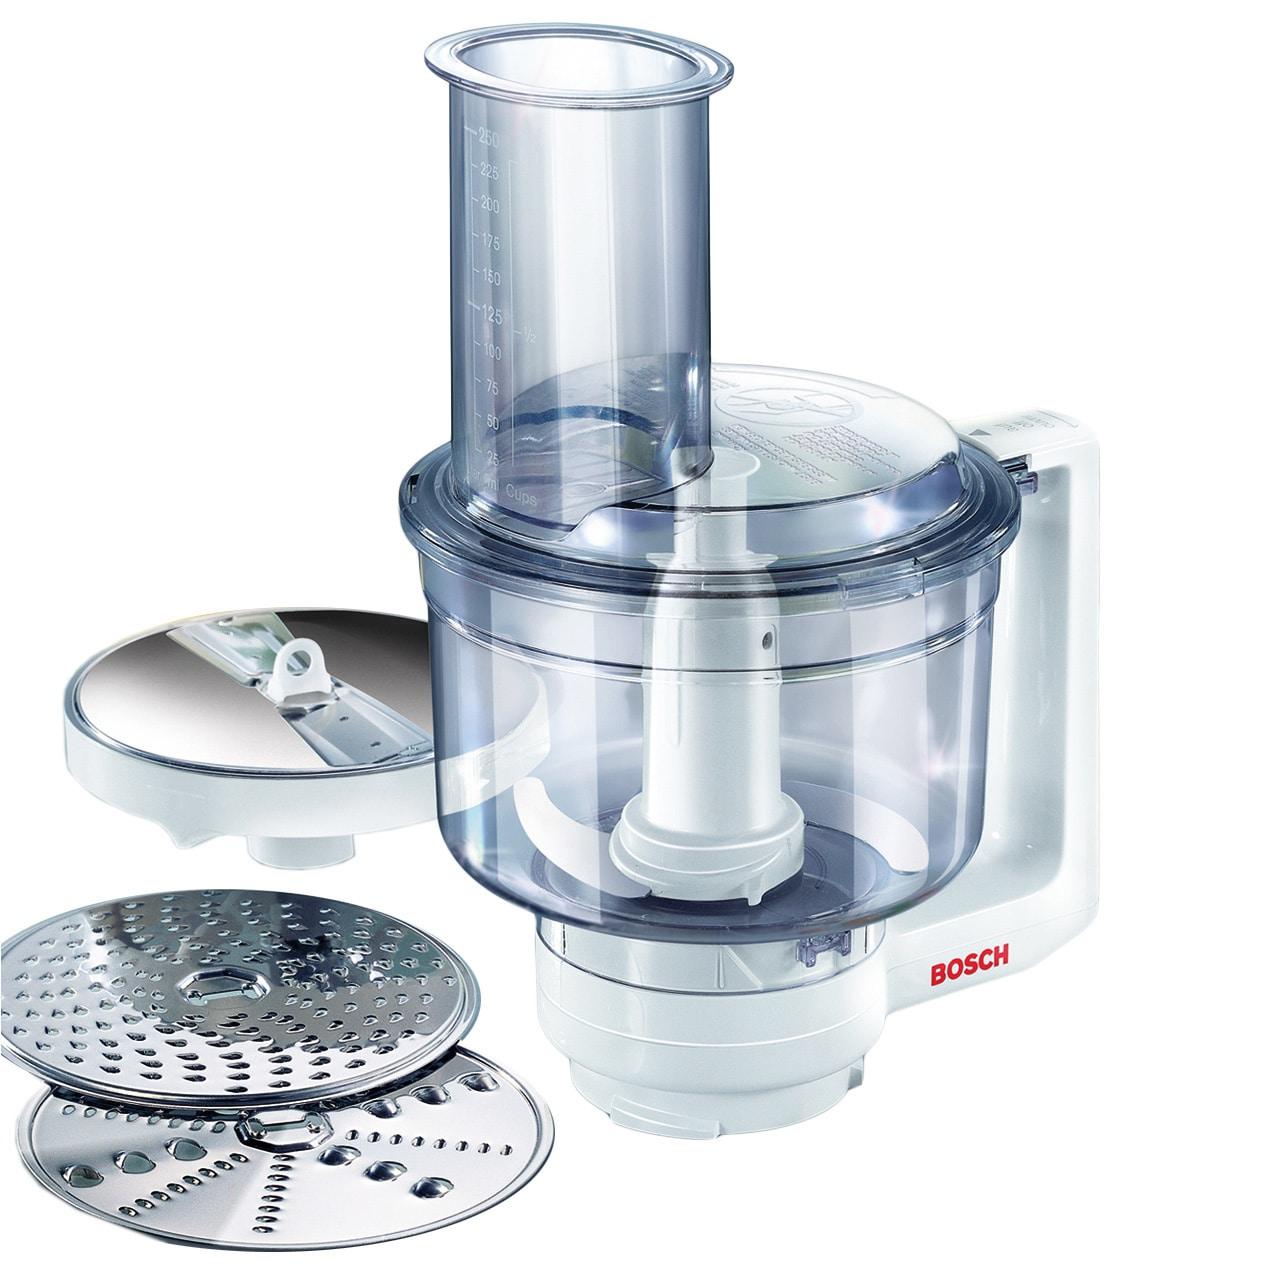 Shop Bosch Food Processor Attachment for Universal Plus Mixer - Free ...